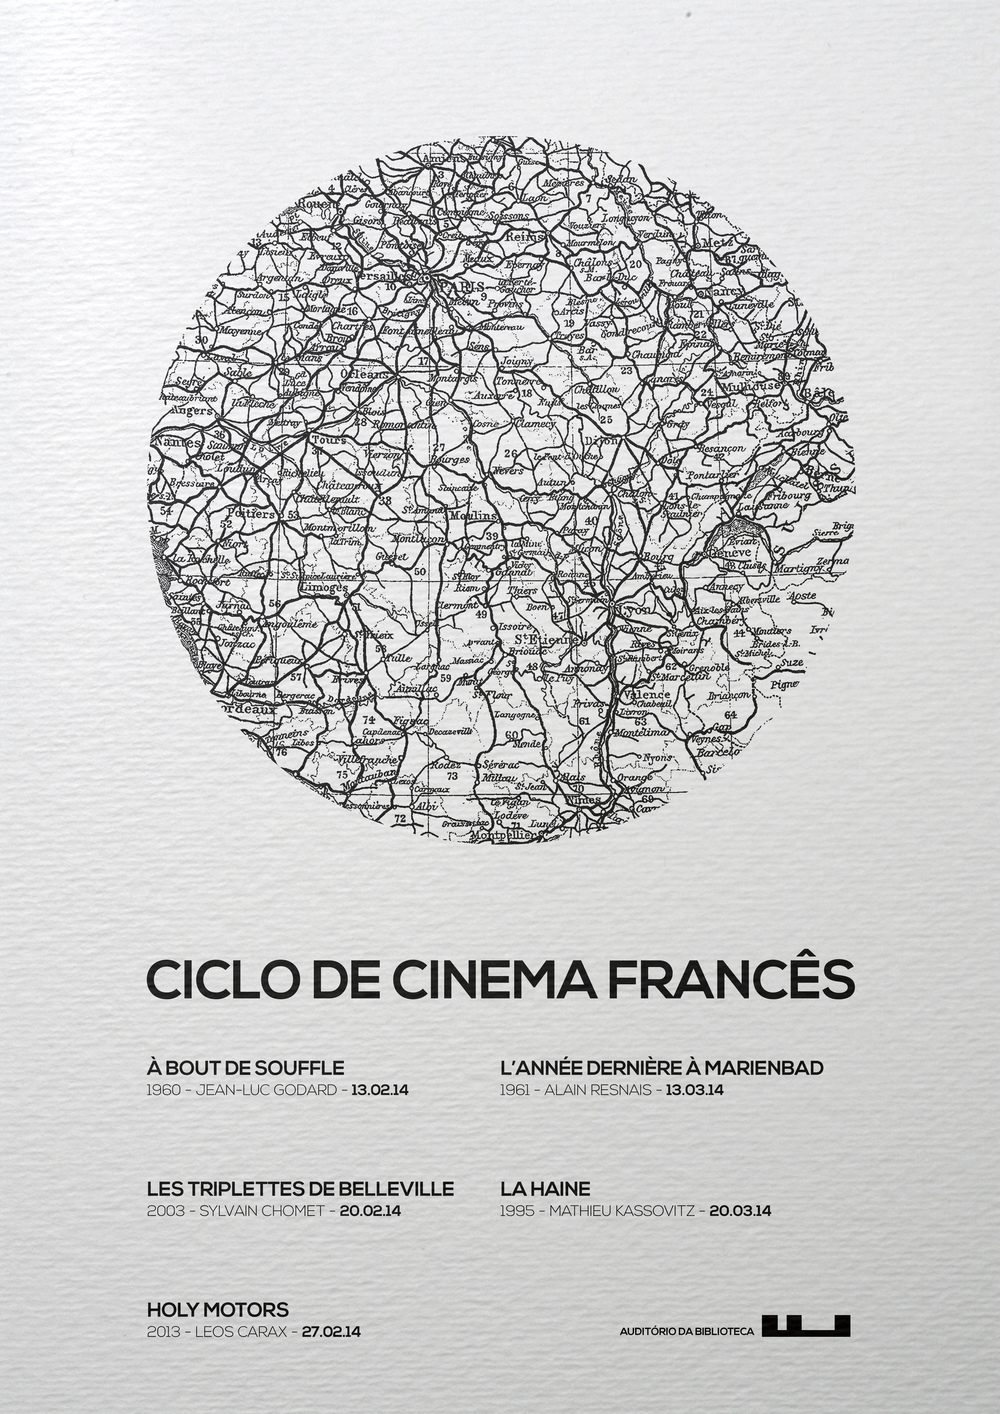 Ciclo de Cinema Francês